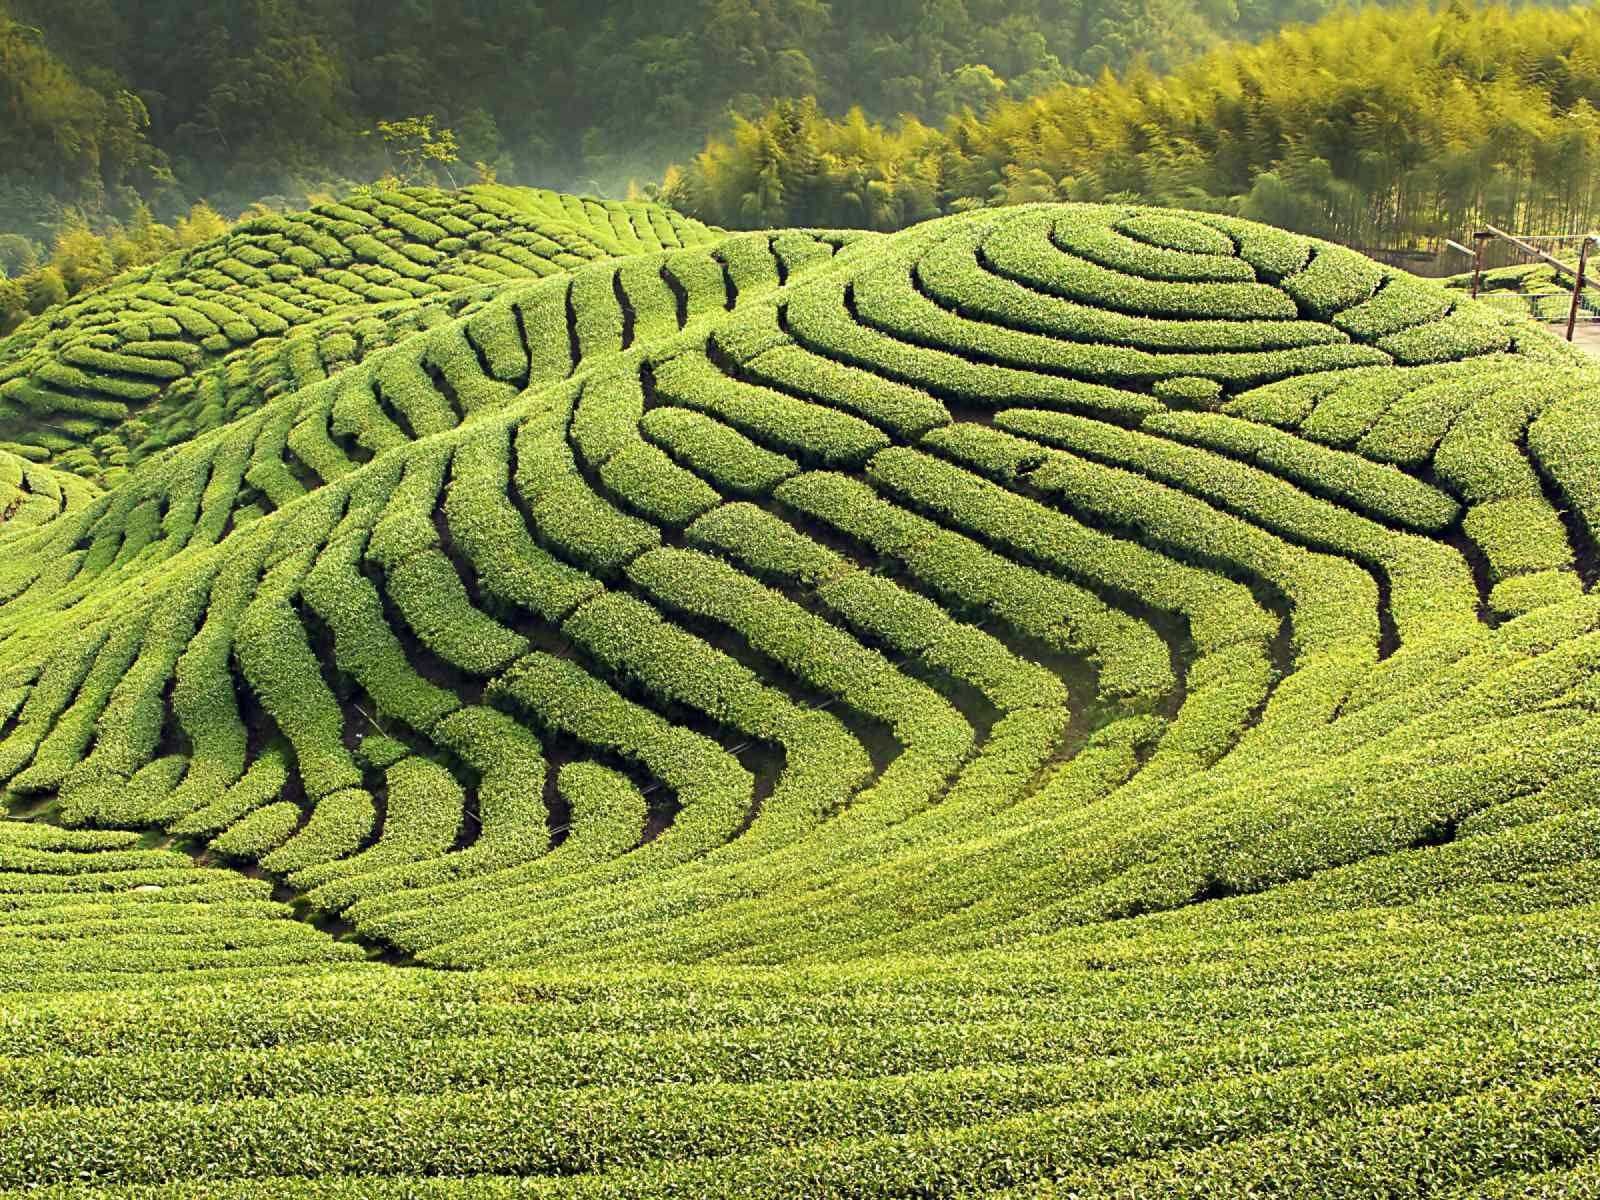 4bb9f73b97eed7fb742f8e3f47018e93 - Things To Do In Tea Gardens